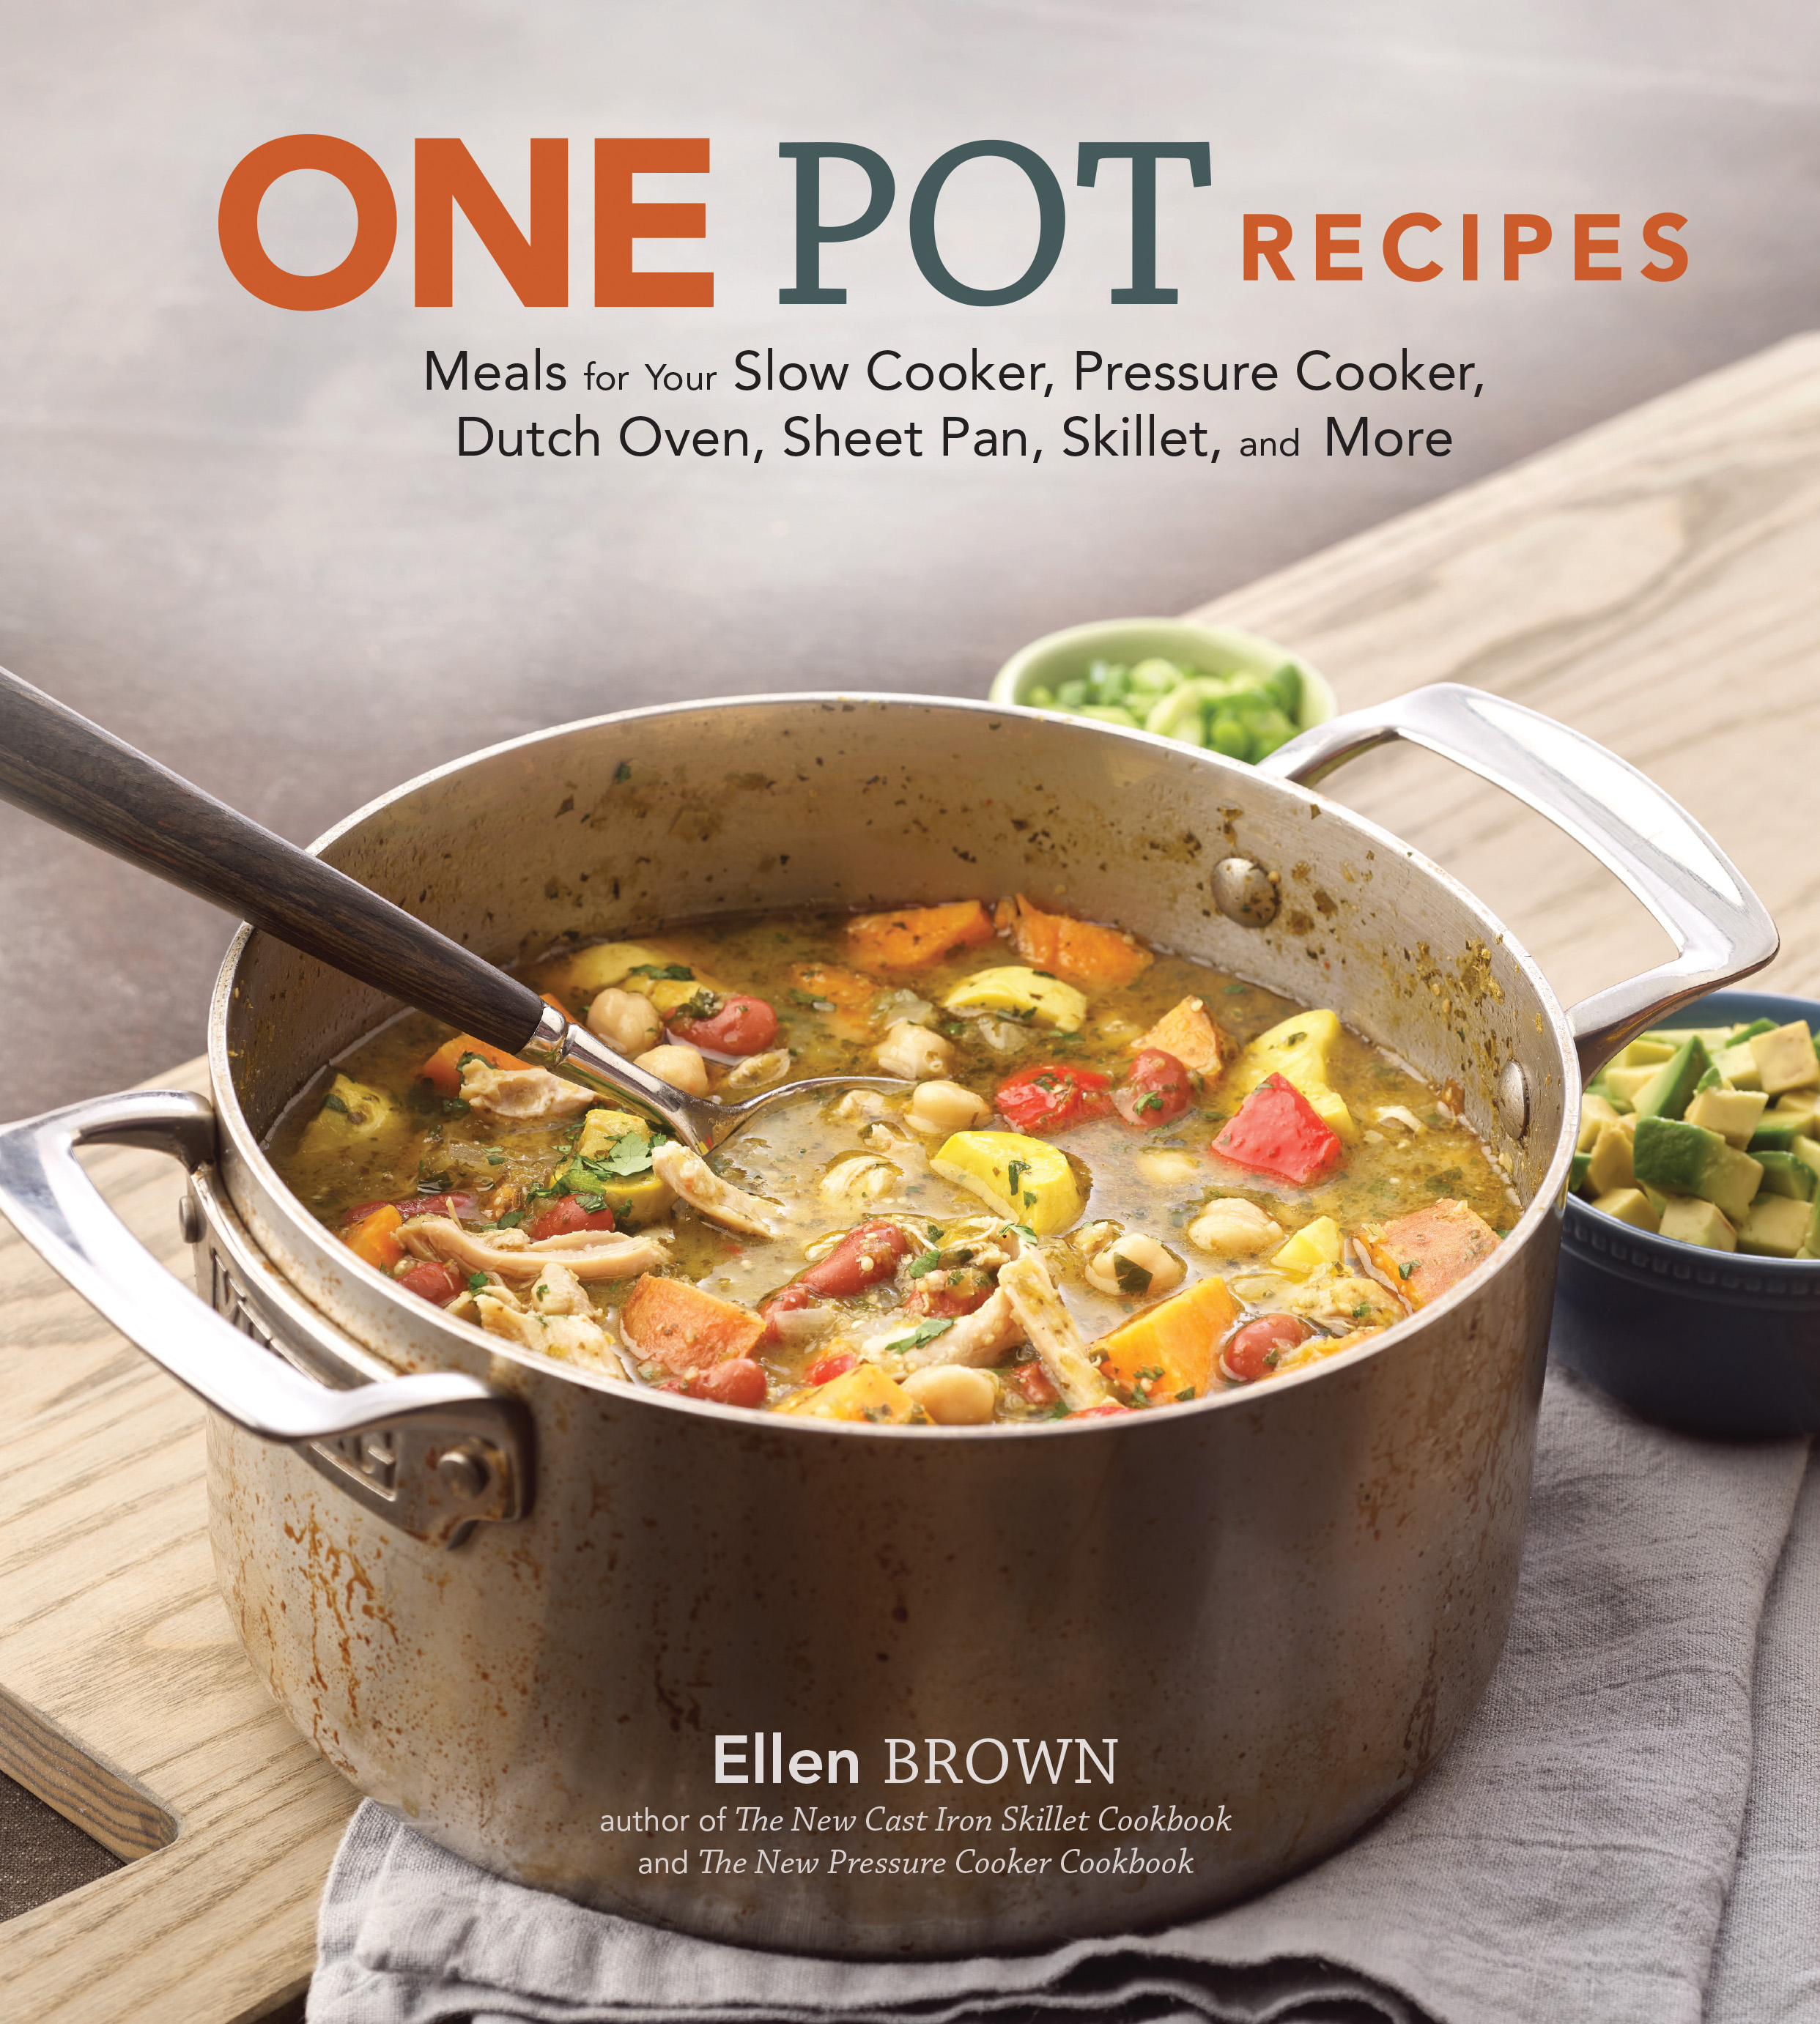 One Pot Recipes COVER.jpg